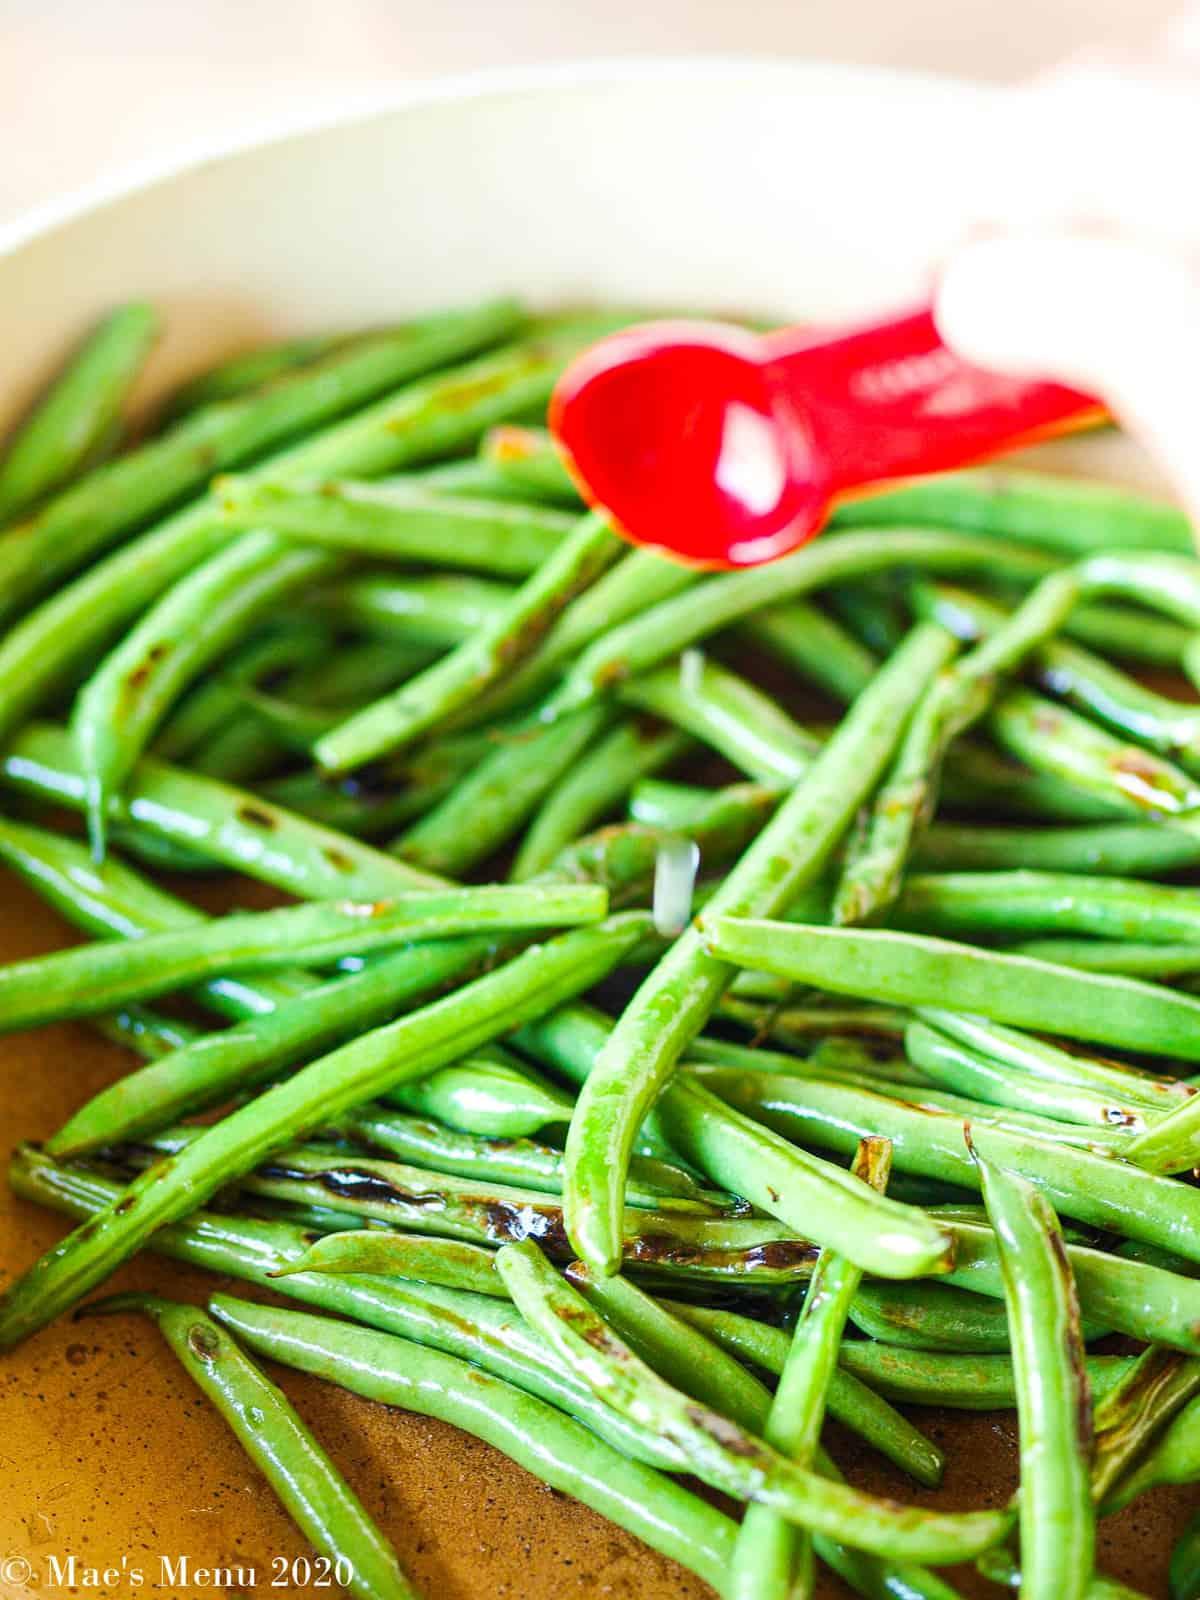 Seasoning the green beans with lemon juice